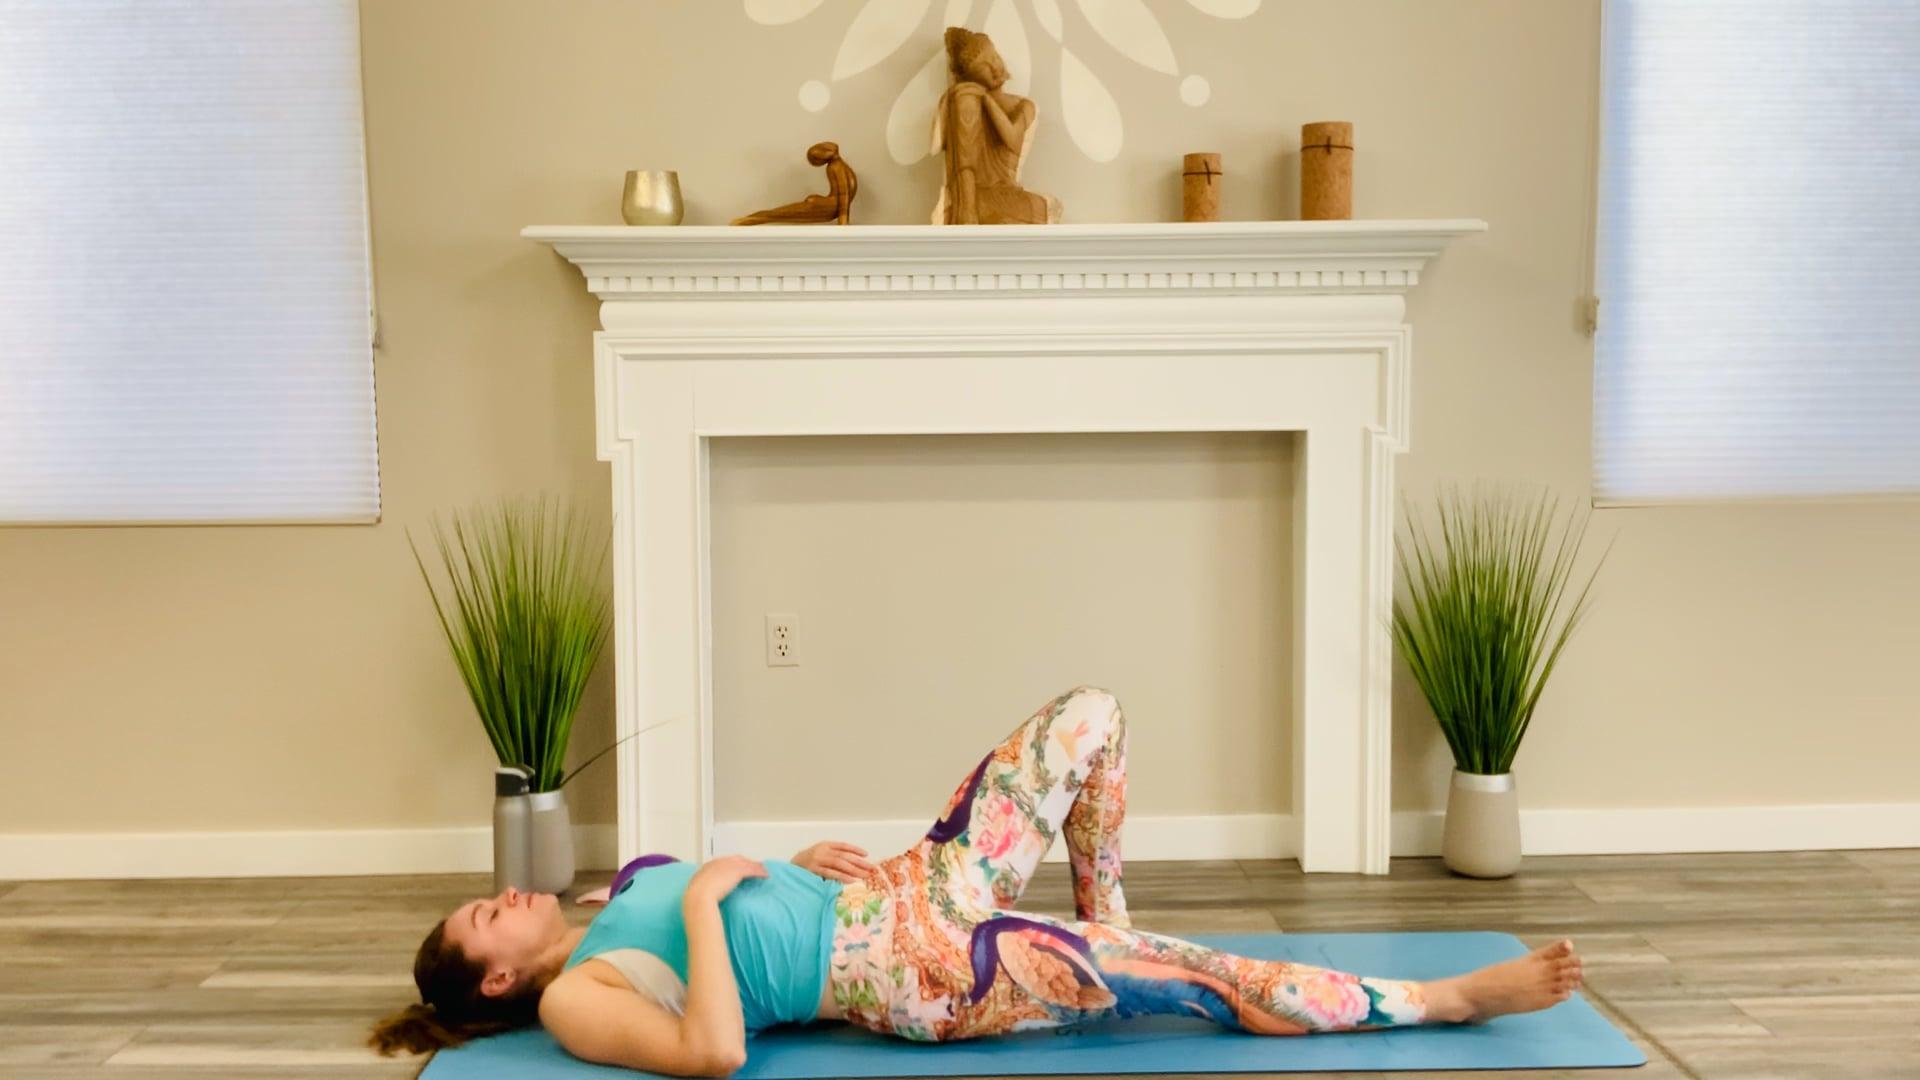 Nadi Method Relax & Massage 4-17-21 - 30 Minutes